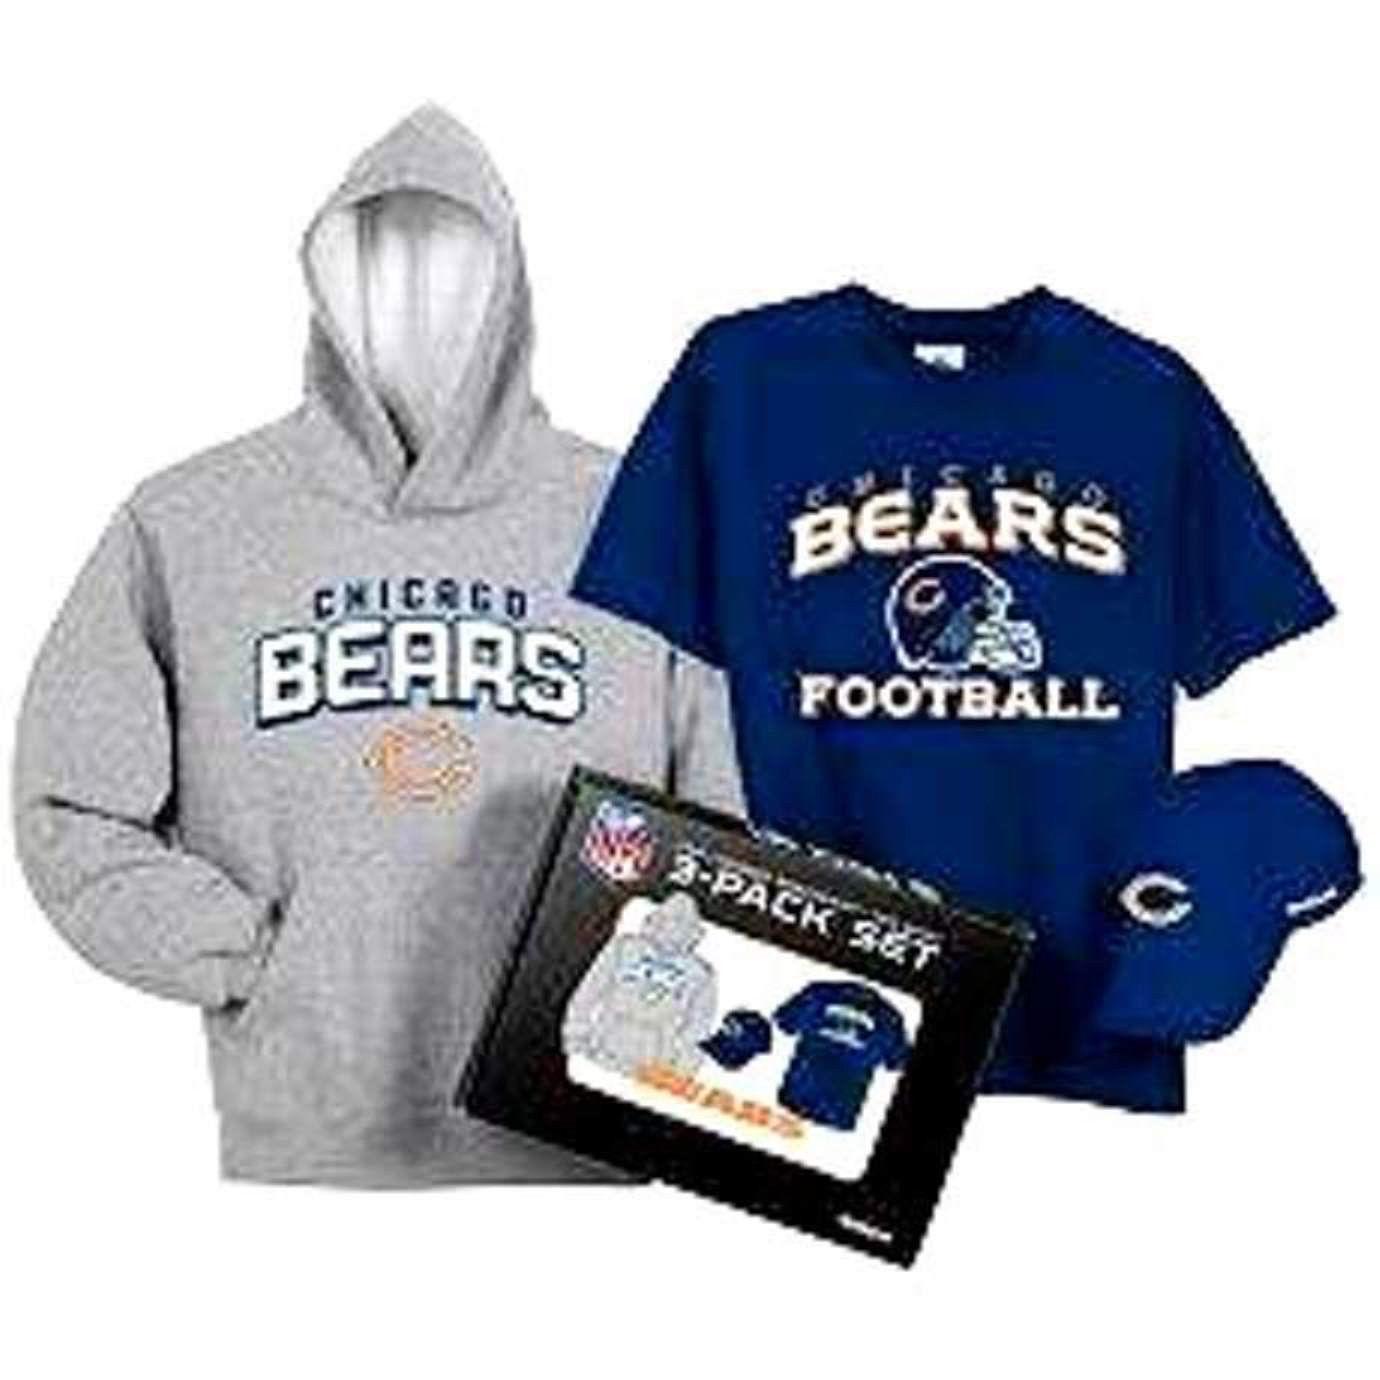 BOYS OR GIRLS 10 / 12 - Reebok - NFL Chicago Bears HOODY, HAT & T-SHIRT GIFT SET